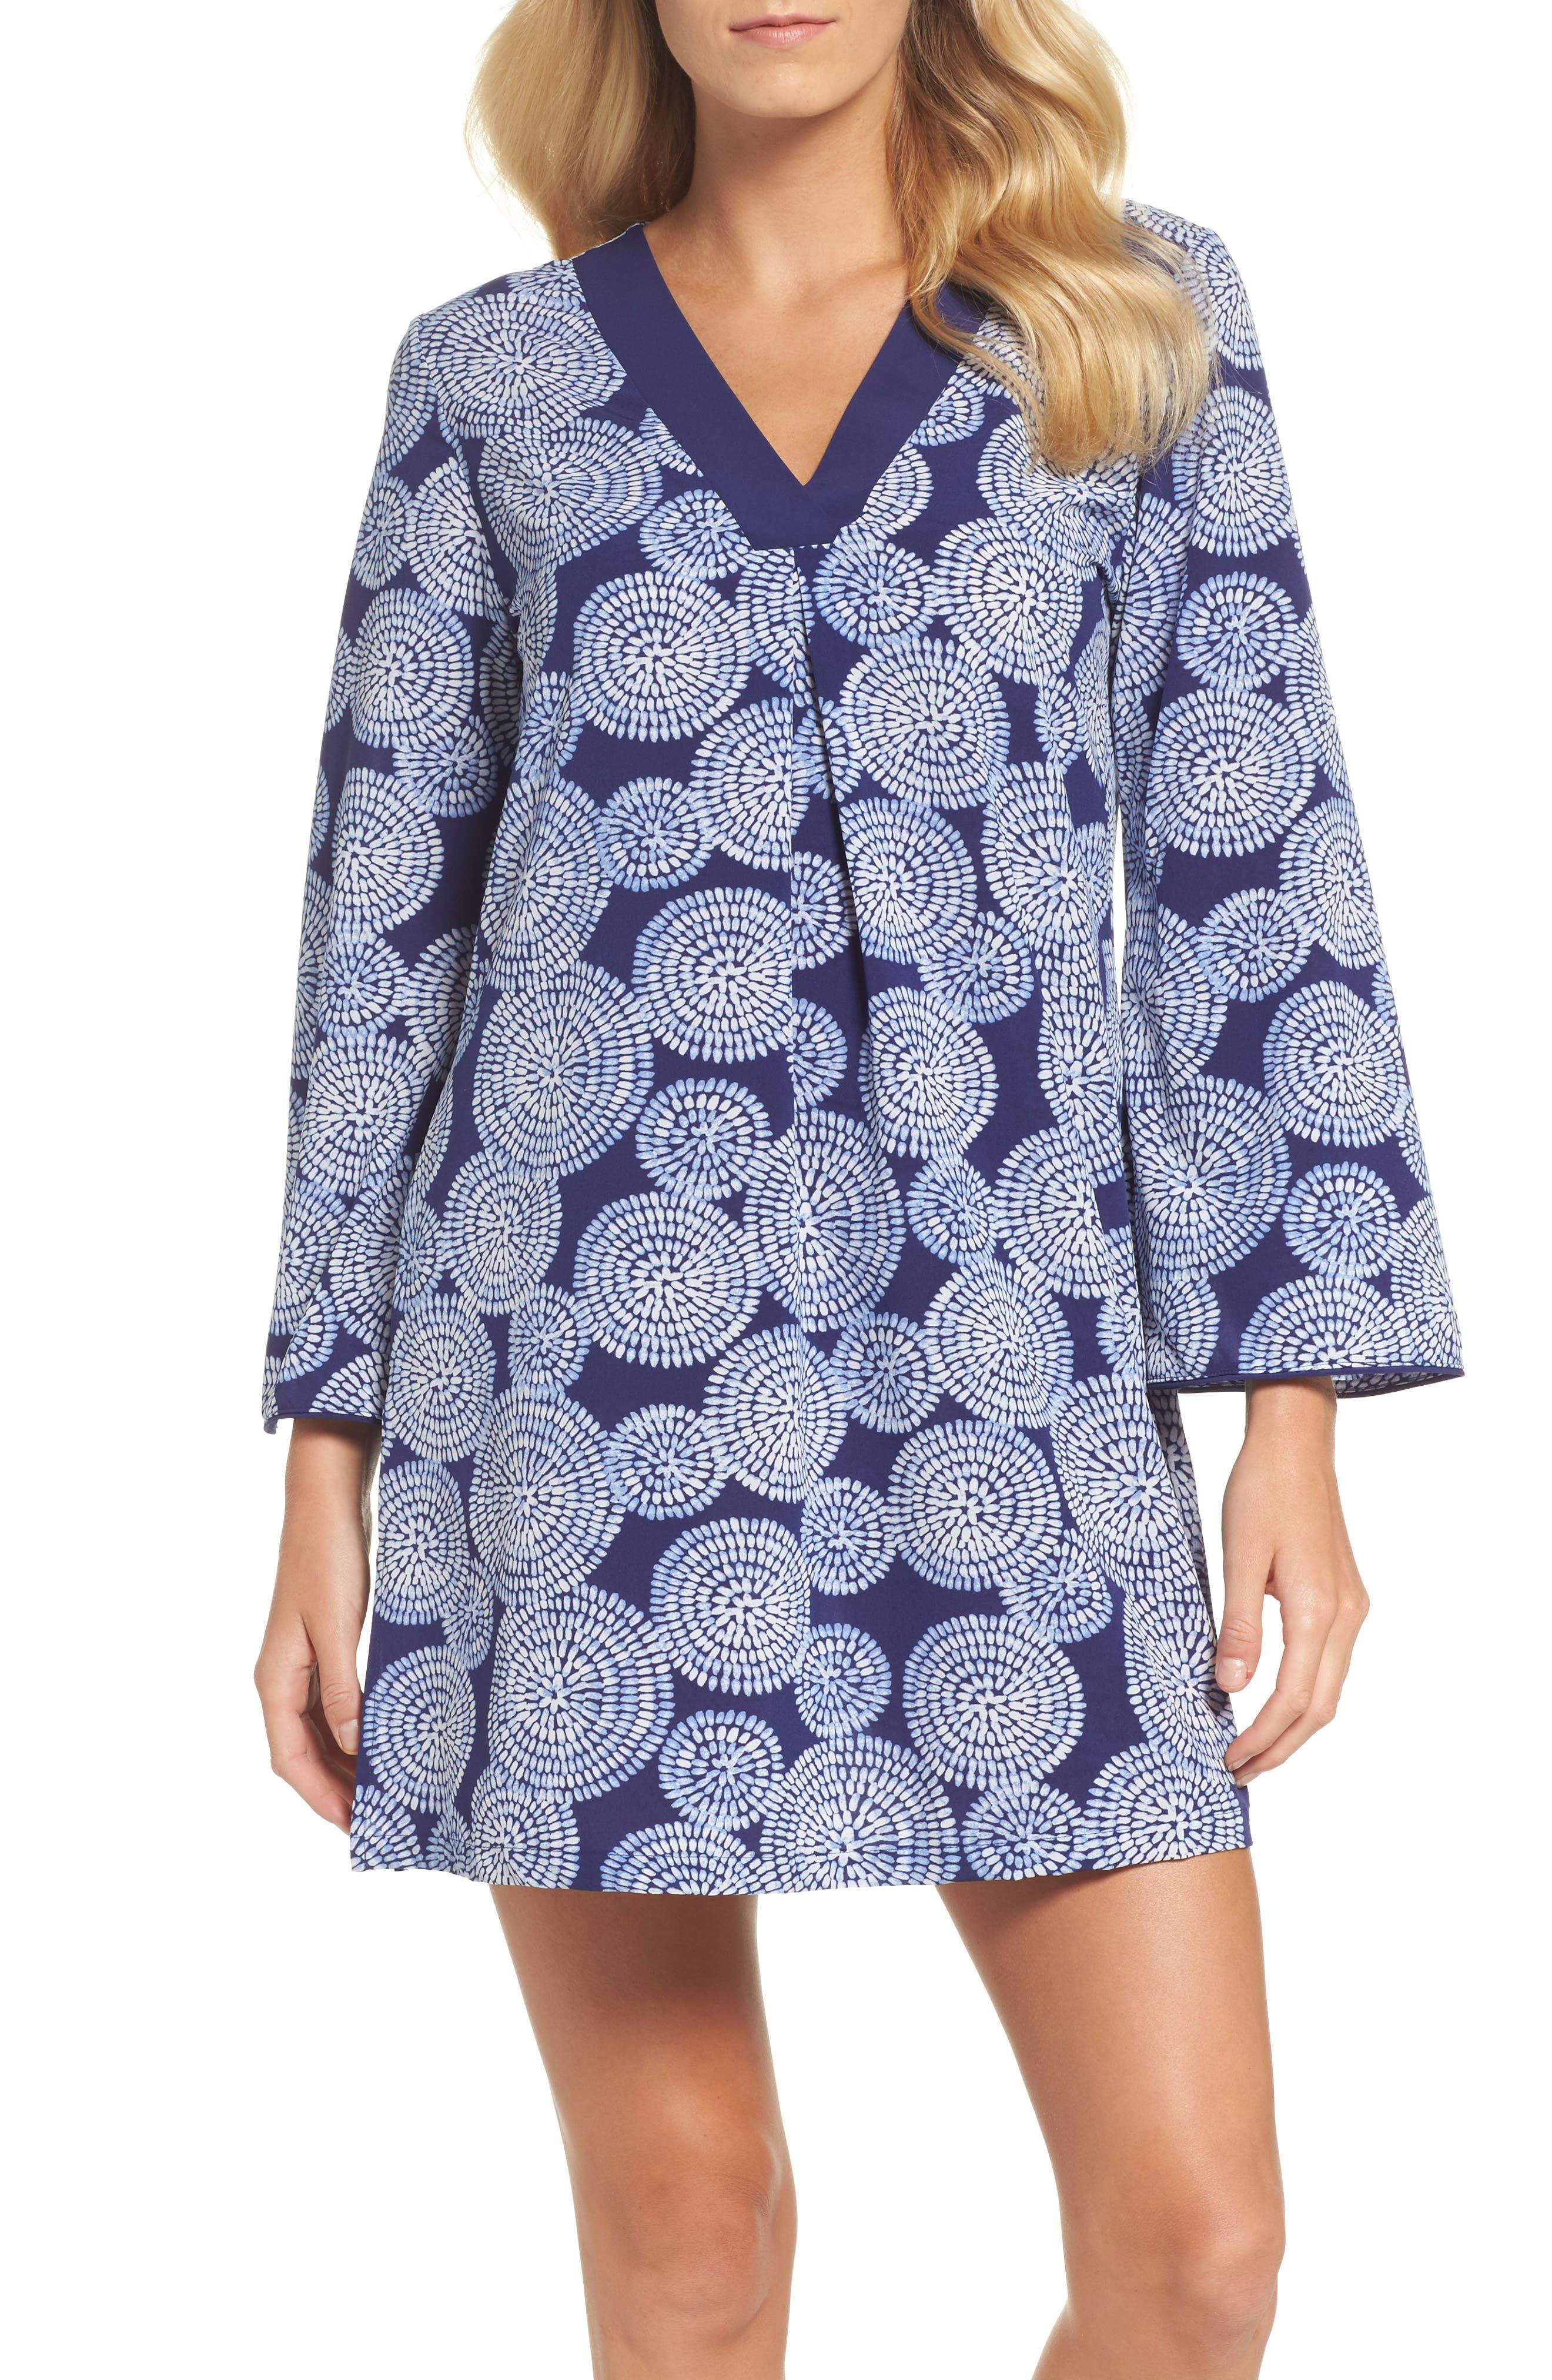 Sleepwear Halftan Short Nightgown,                             Main thumbnail 1, color,                             Eclipse Print